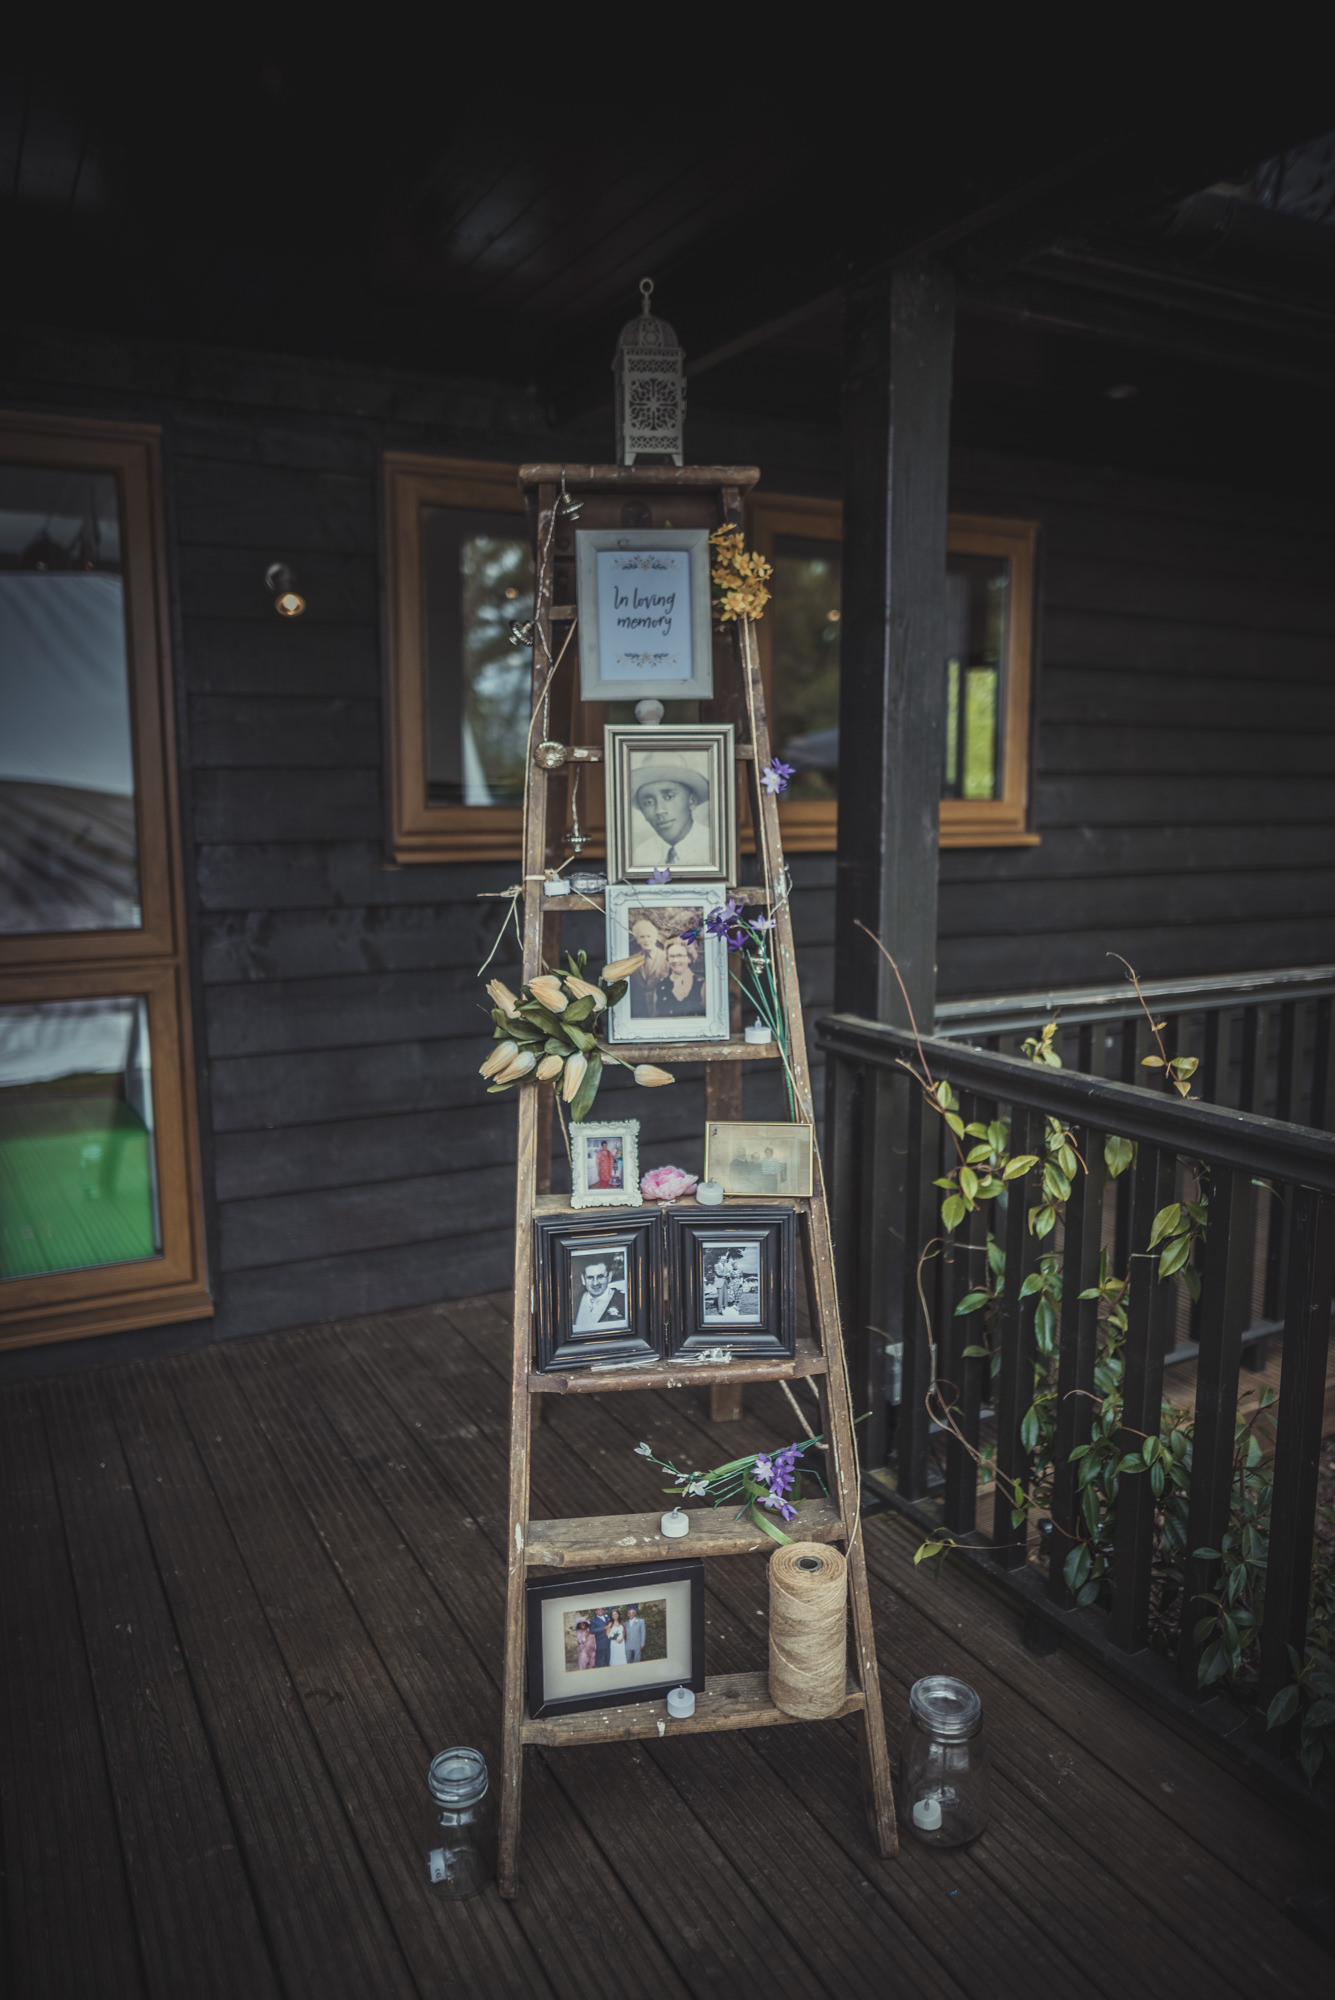 Jacqueline-Gareth-Wedding-Westmead-Events-Surrey-Manu-Mendoza-Wedding-Photography-155.jpg